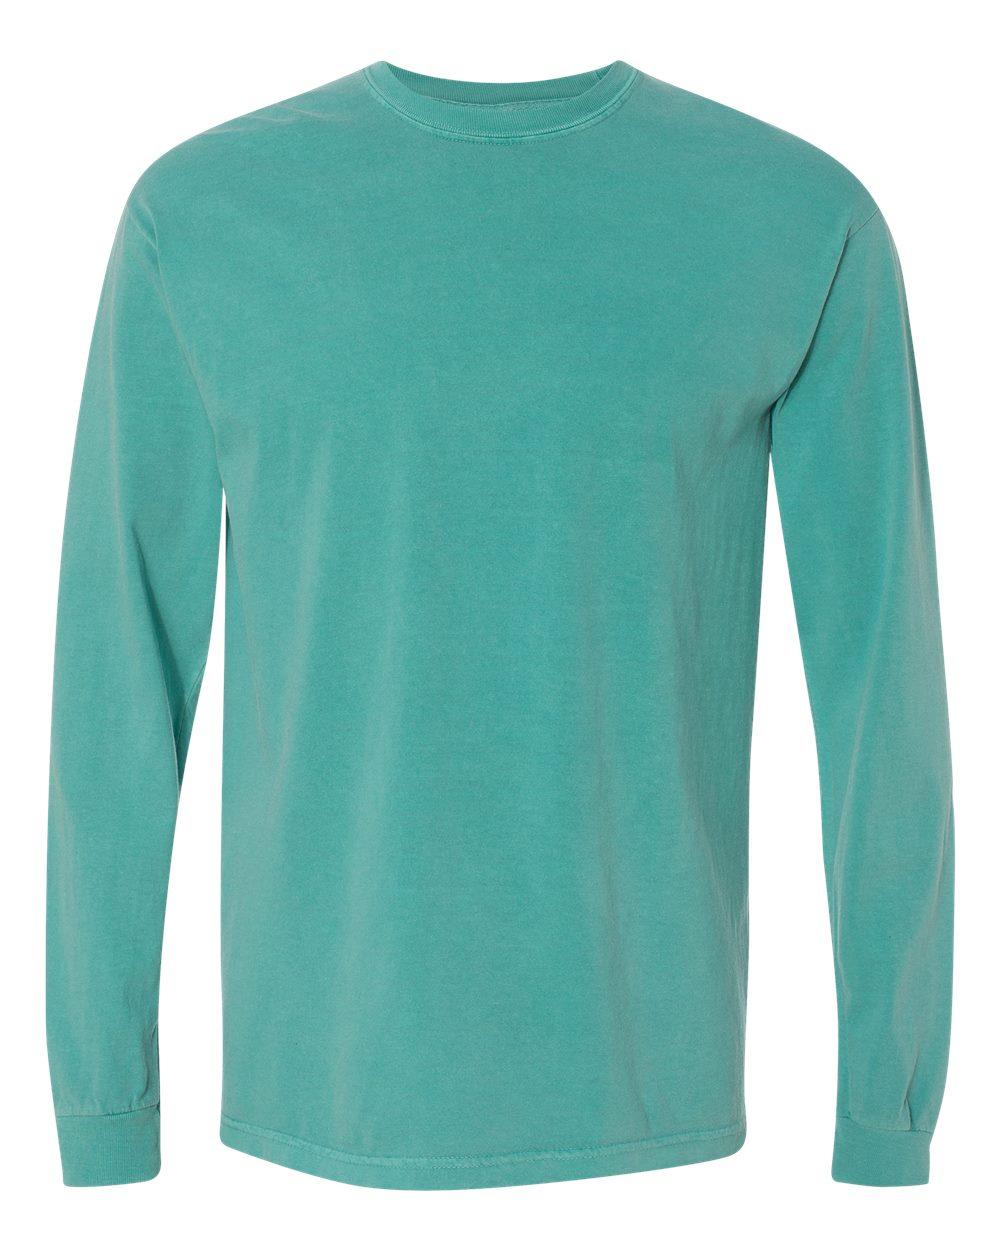 Comfort Colors 6.1 Ounce Ringspun Cotton Long Sleeve T-shirt 6014 ...